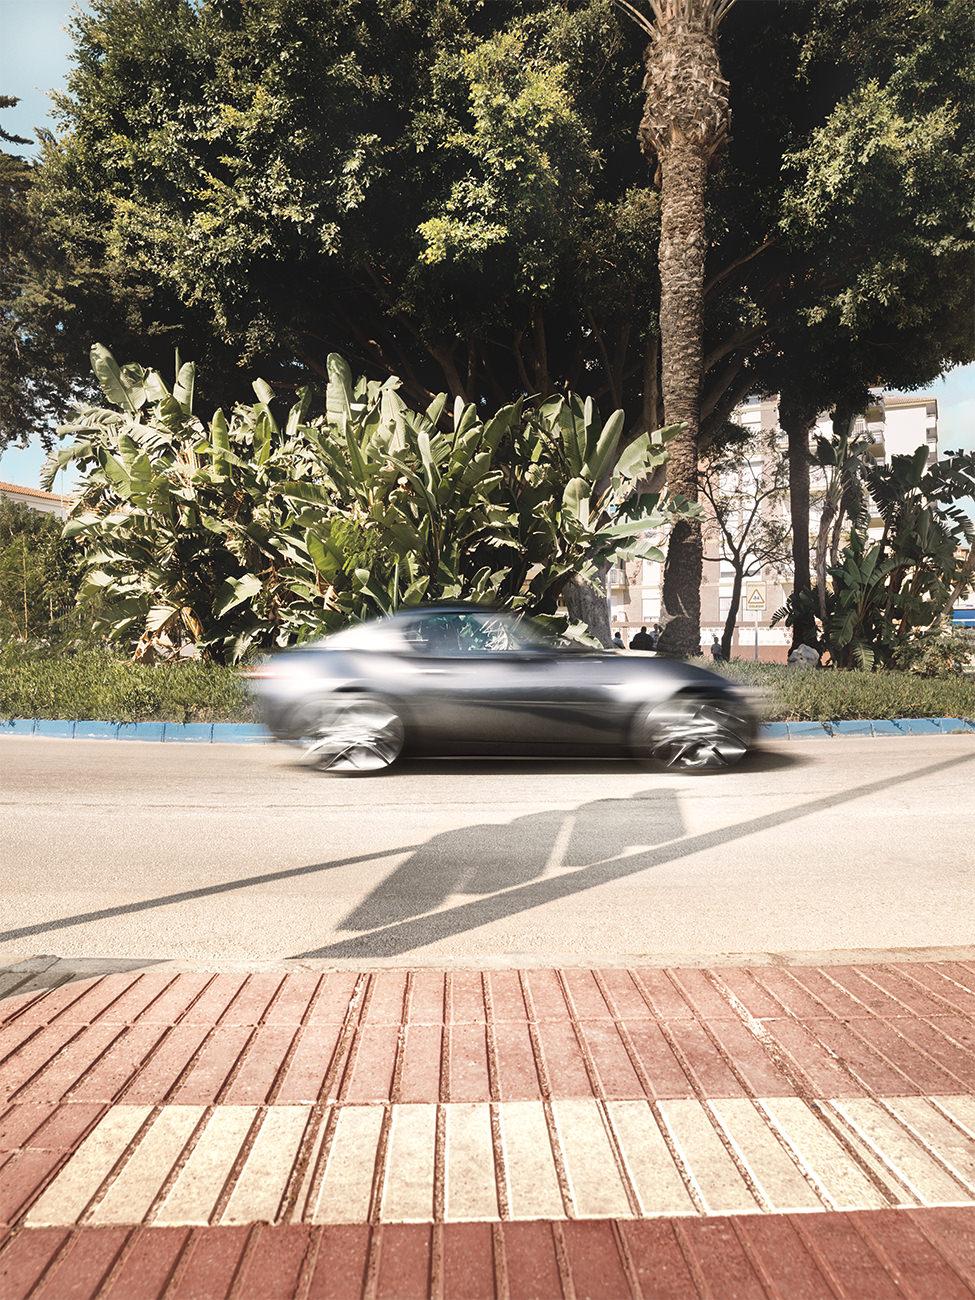 ©ankeluckmann1692, ramp mazda mx5, ramp mazda mx5, editorial, spain, ramp, red indians, mazda, mx5,transportation, kai tietz, anke luckmann, www.ankeluckmann.com, driving